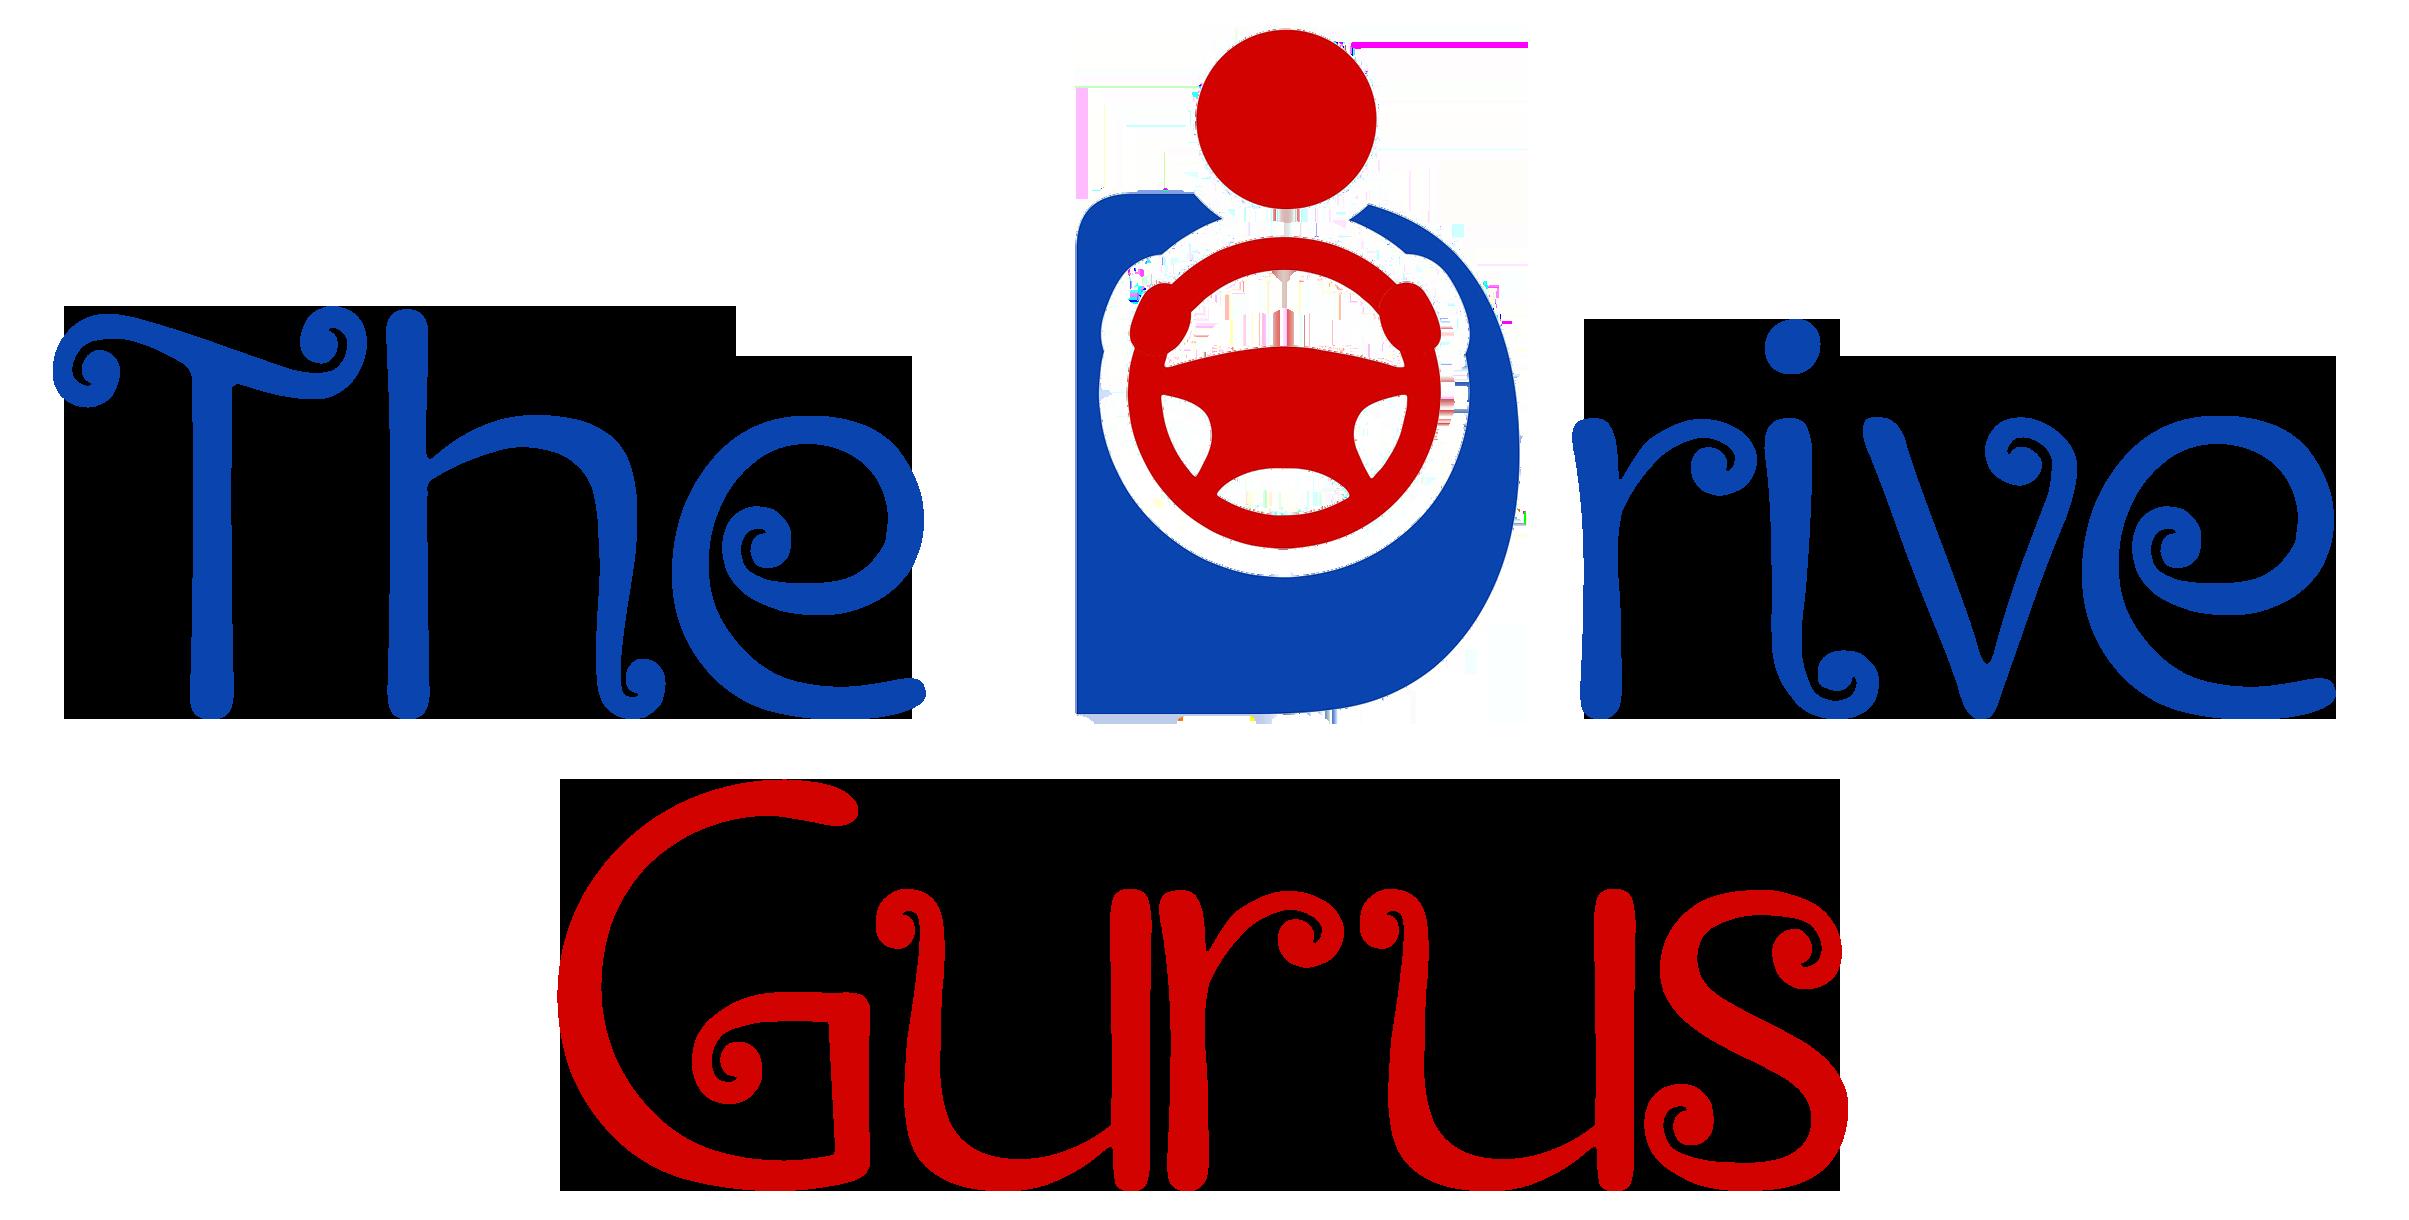 The Drive Gurus